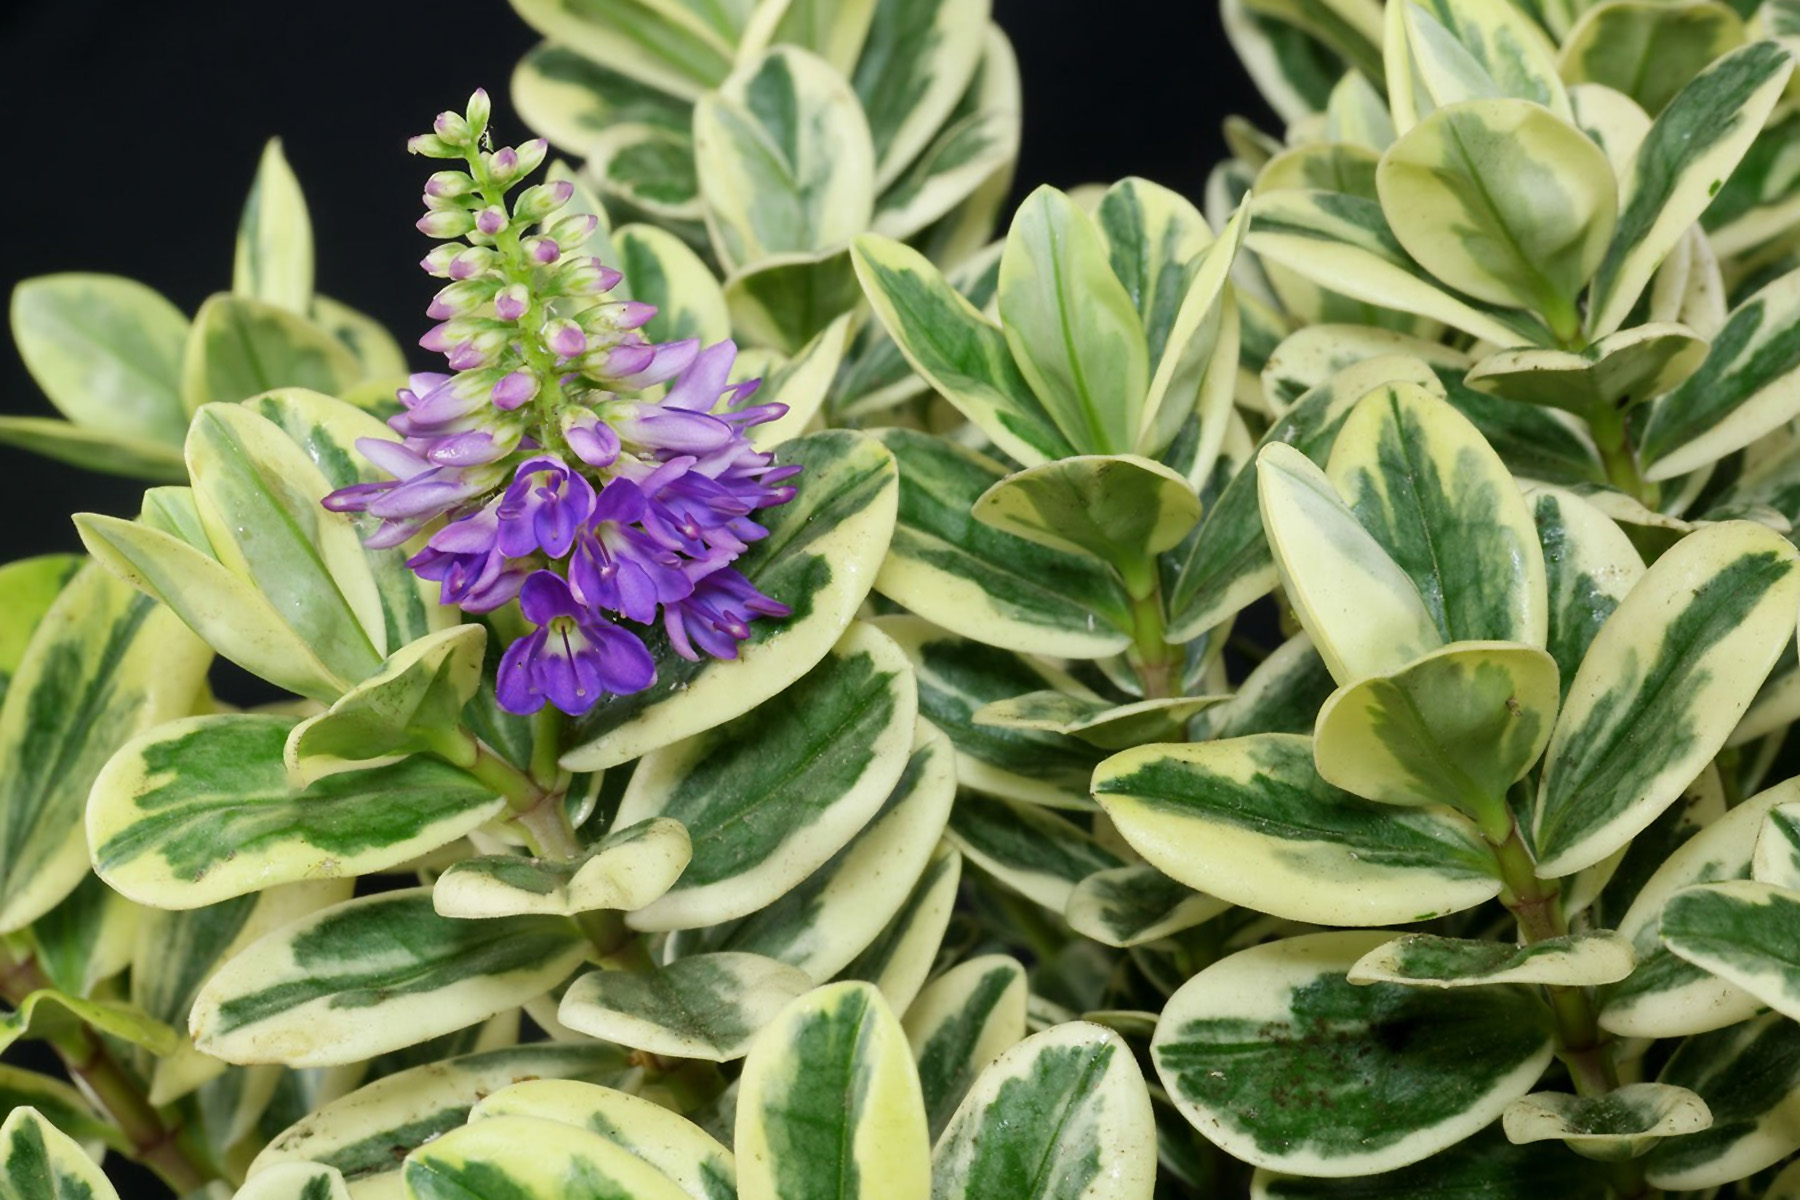 Hebė andersonii variegata